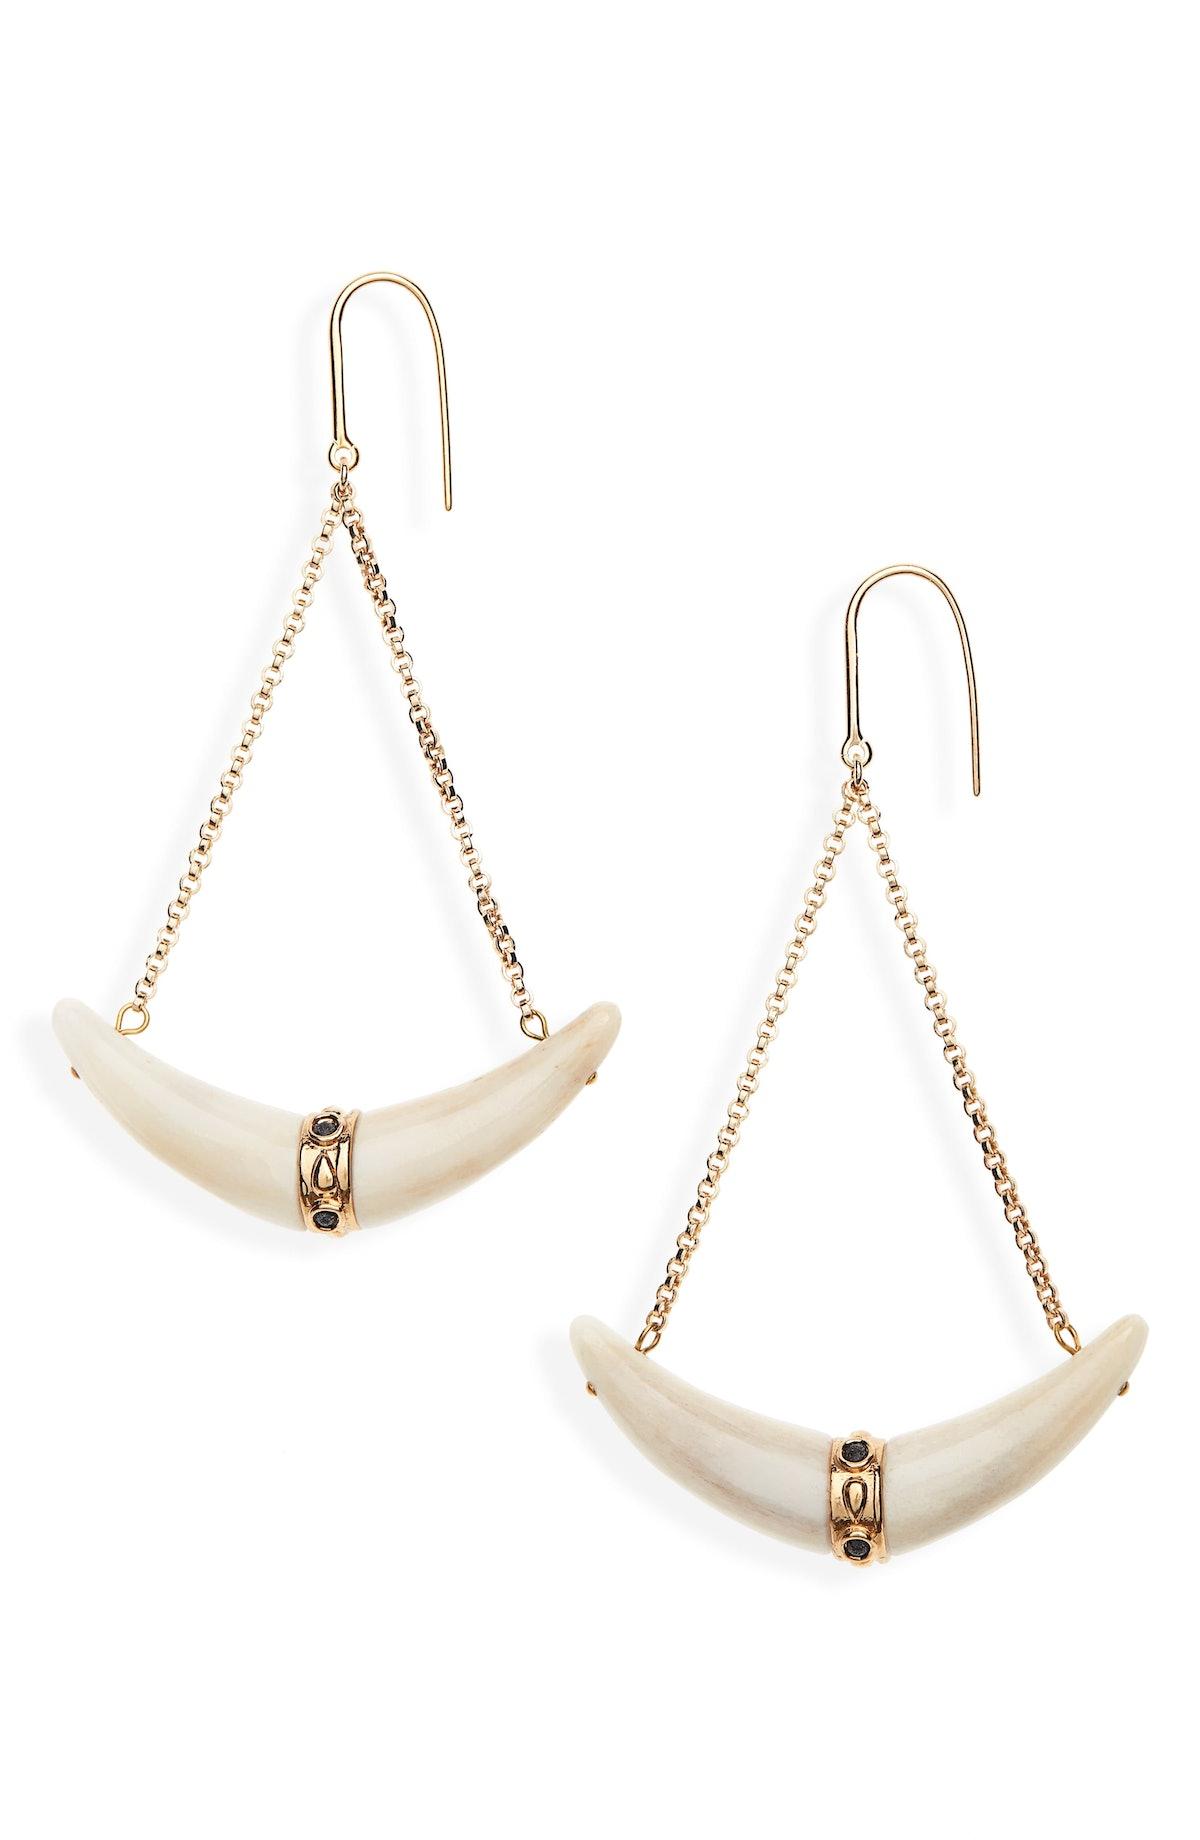 Bouclé D'Oreille Horn Earrings